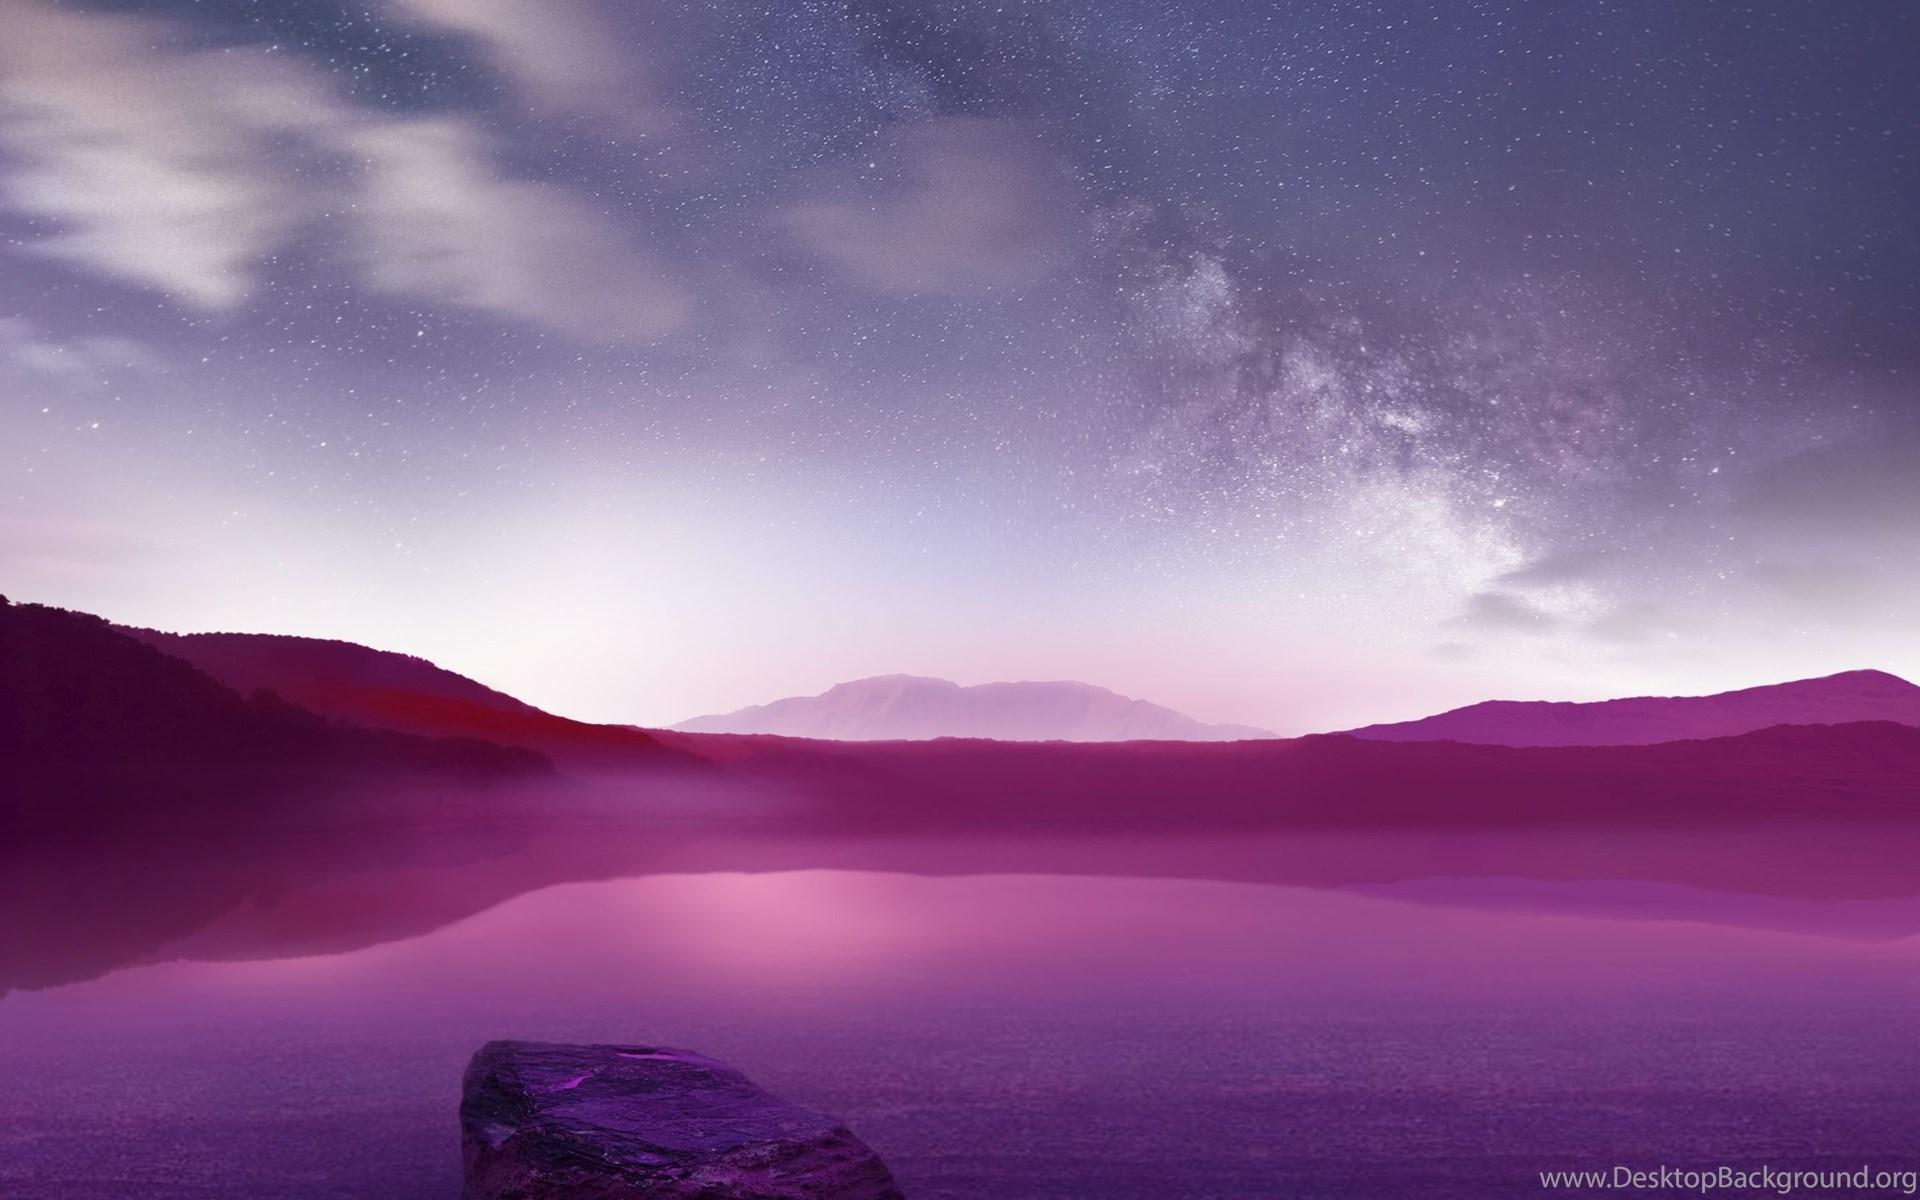 Download All Ten Official Lg V10 Wallpapers Here Desktop Background